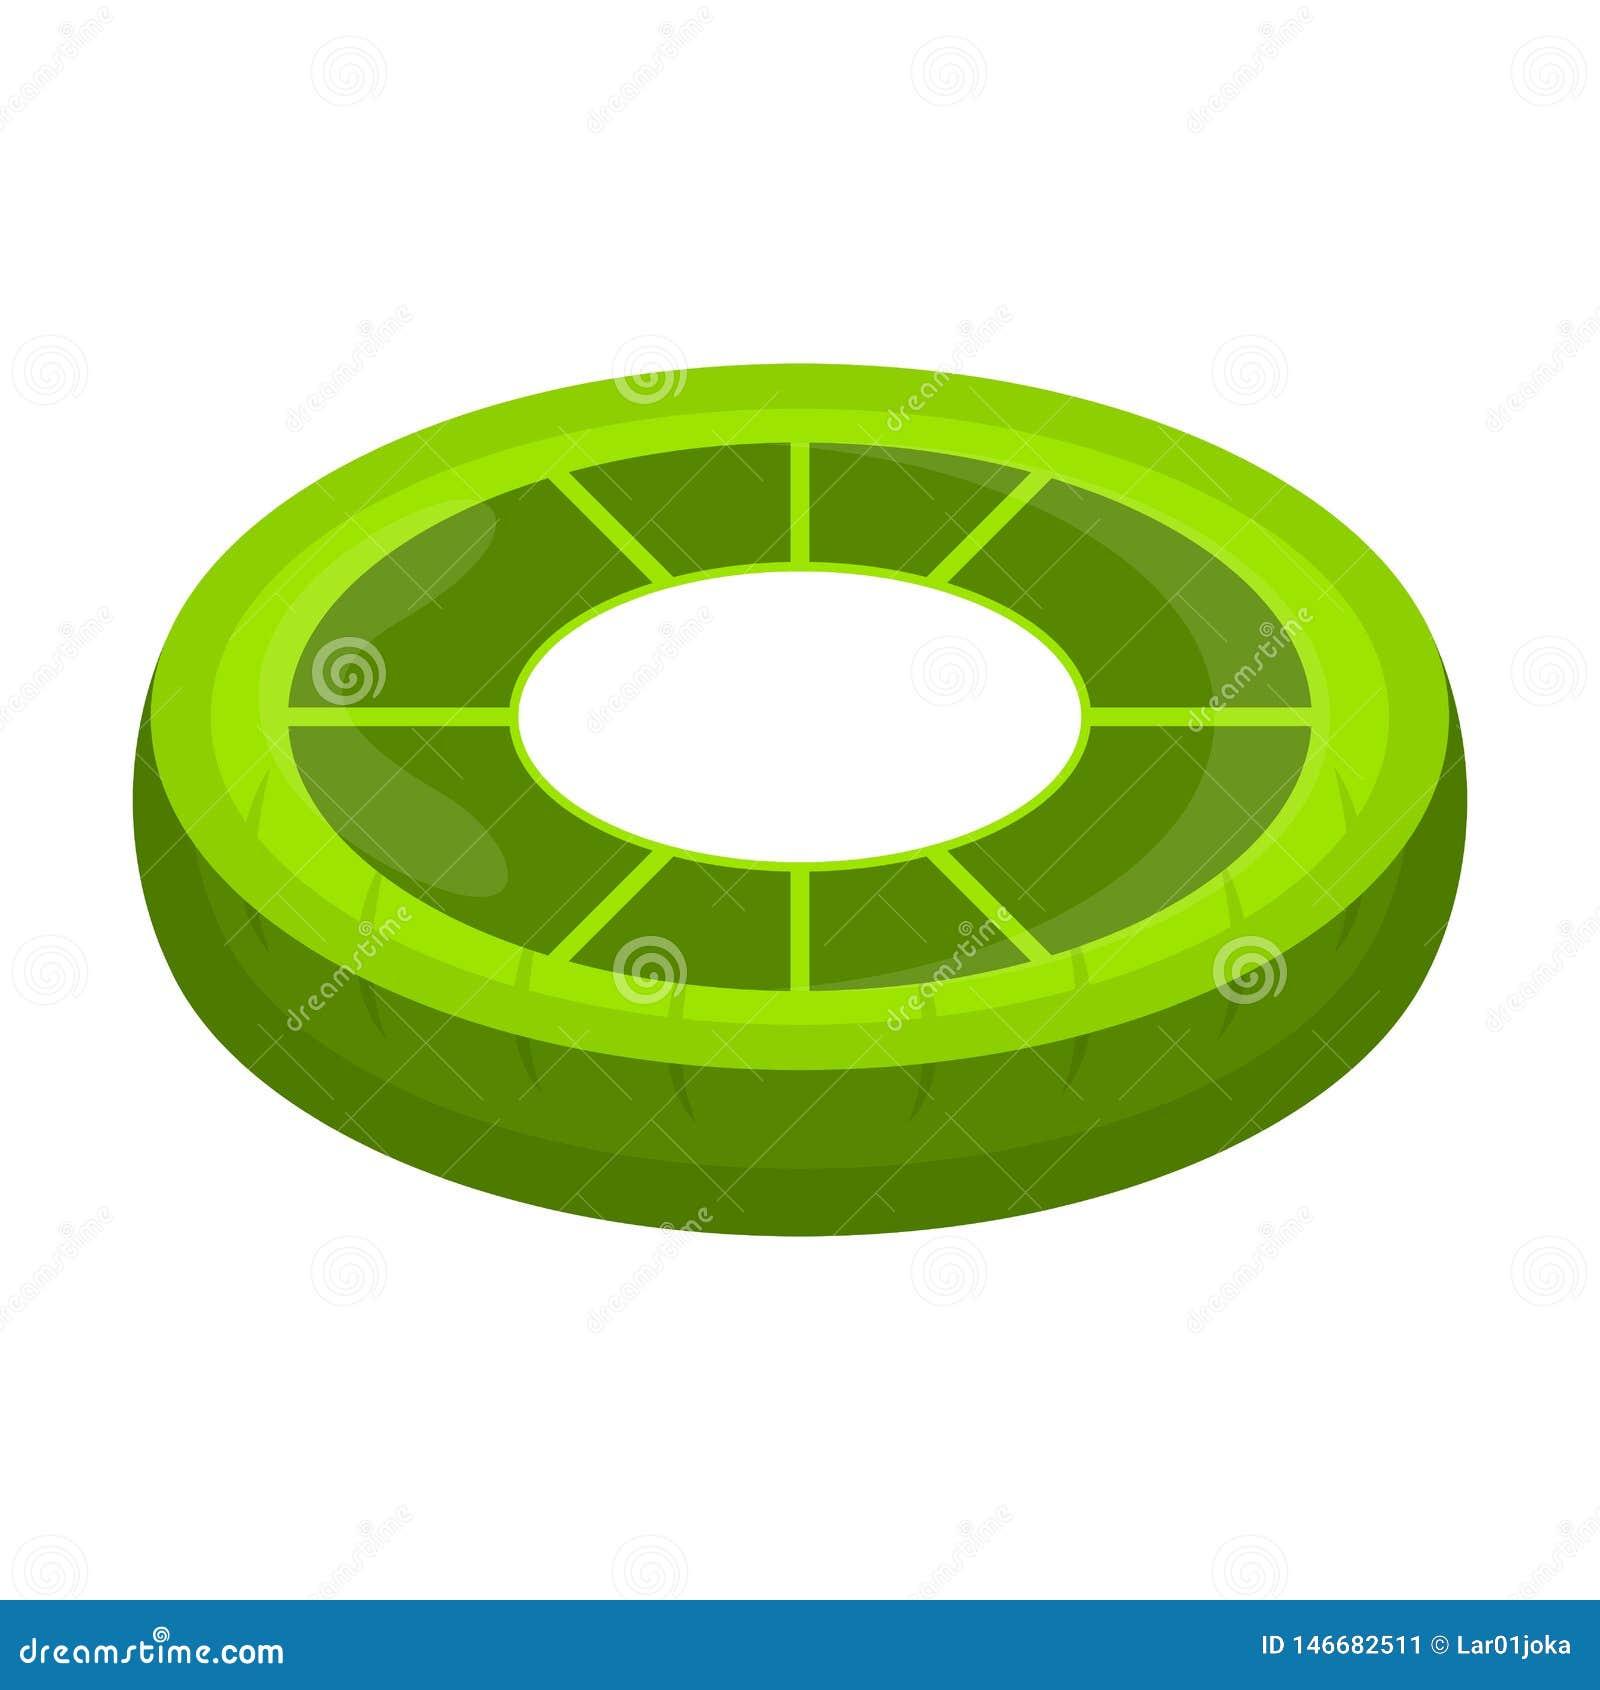 El flotador aislado de la piscina formó imagen del limón